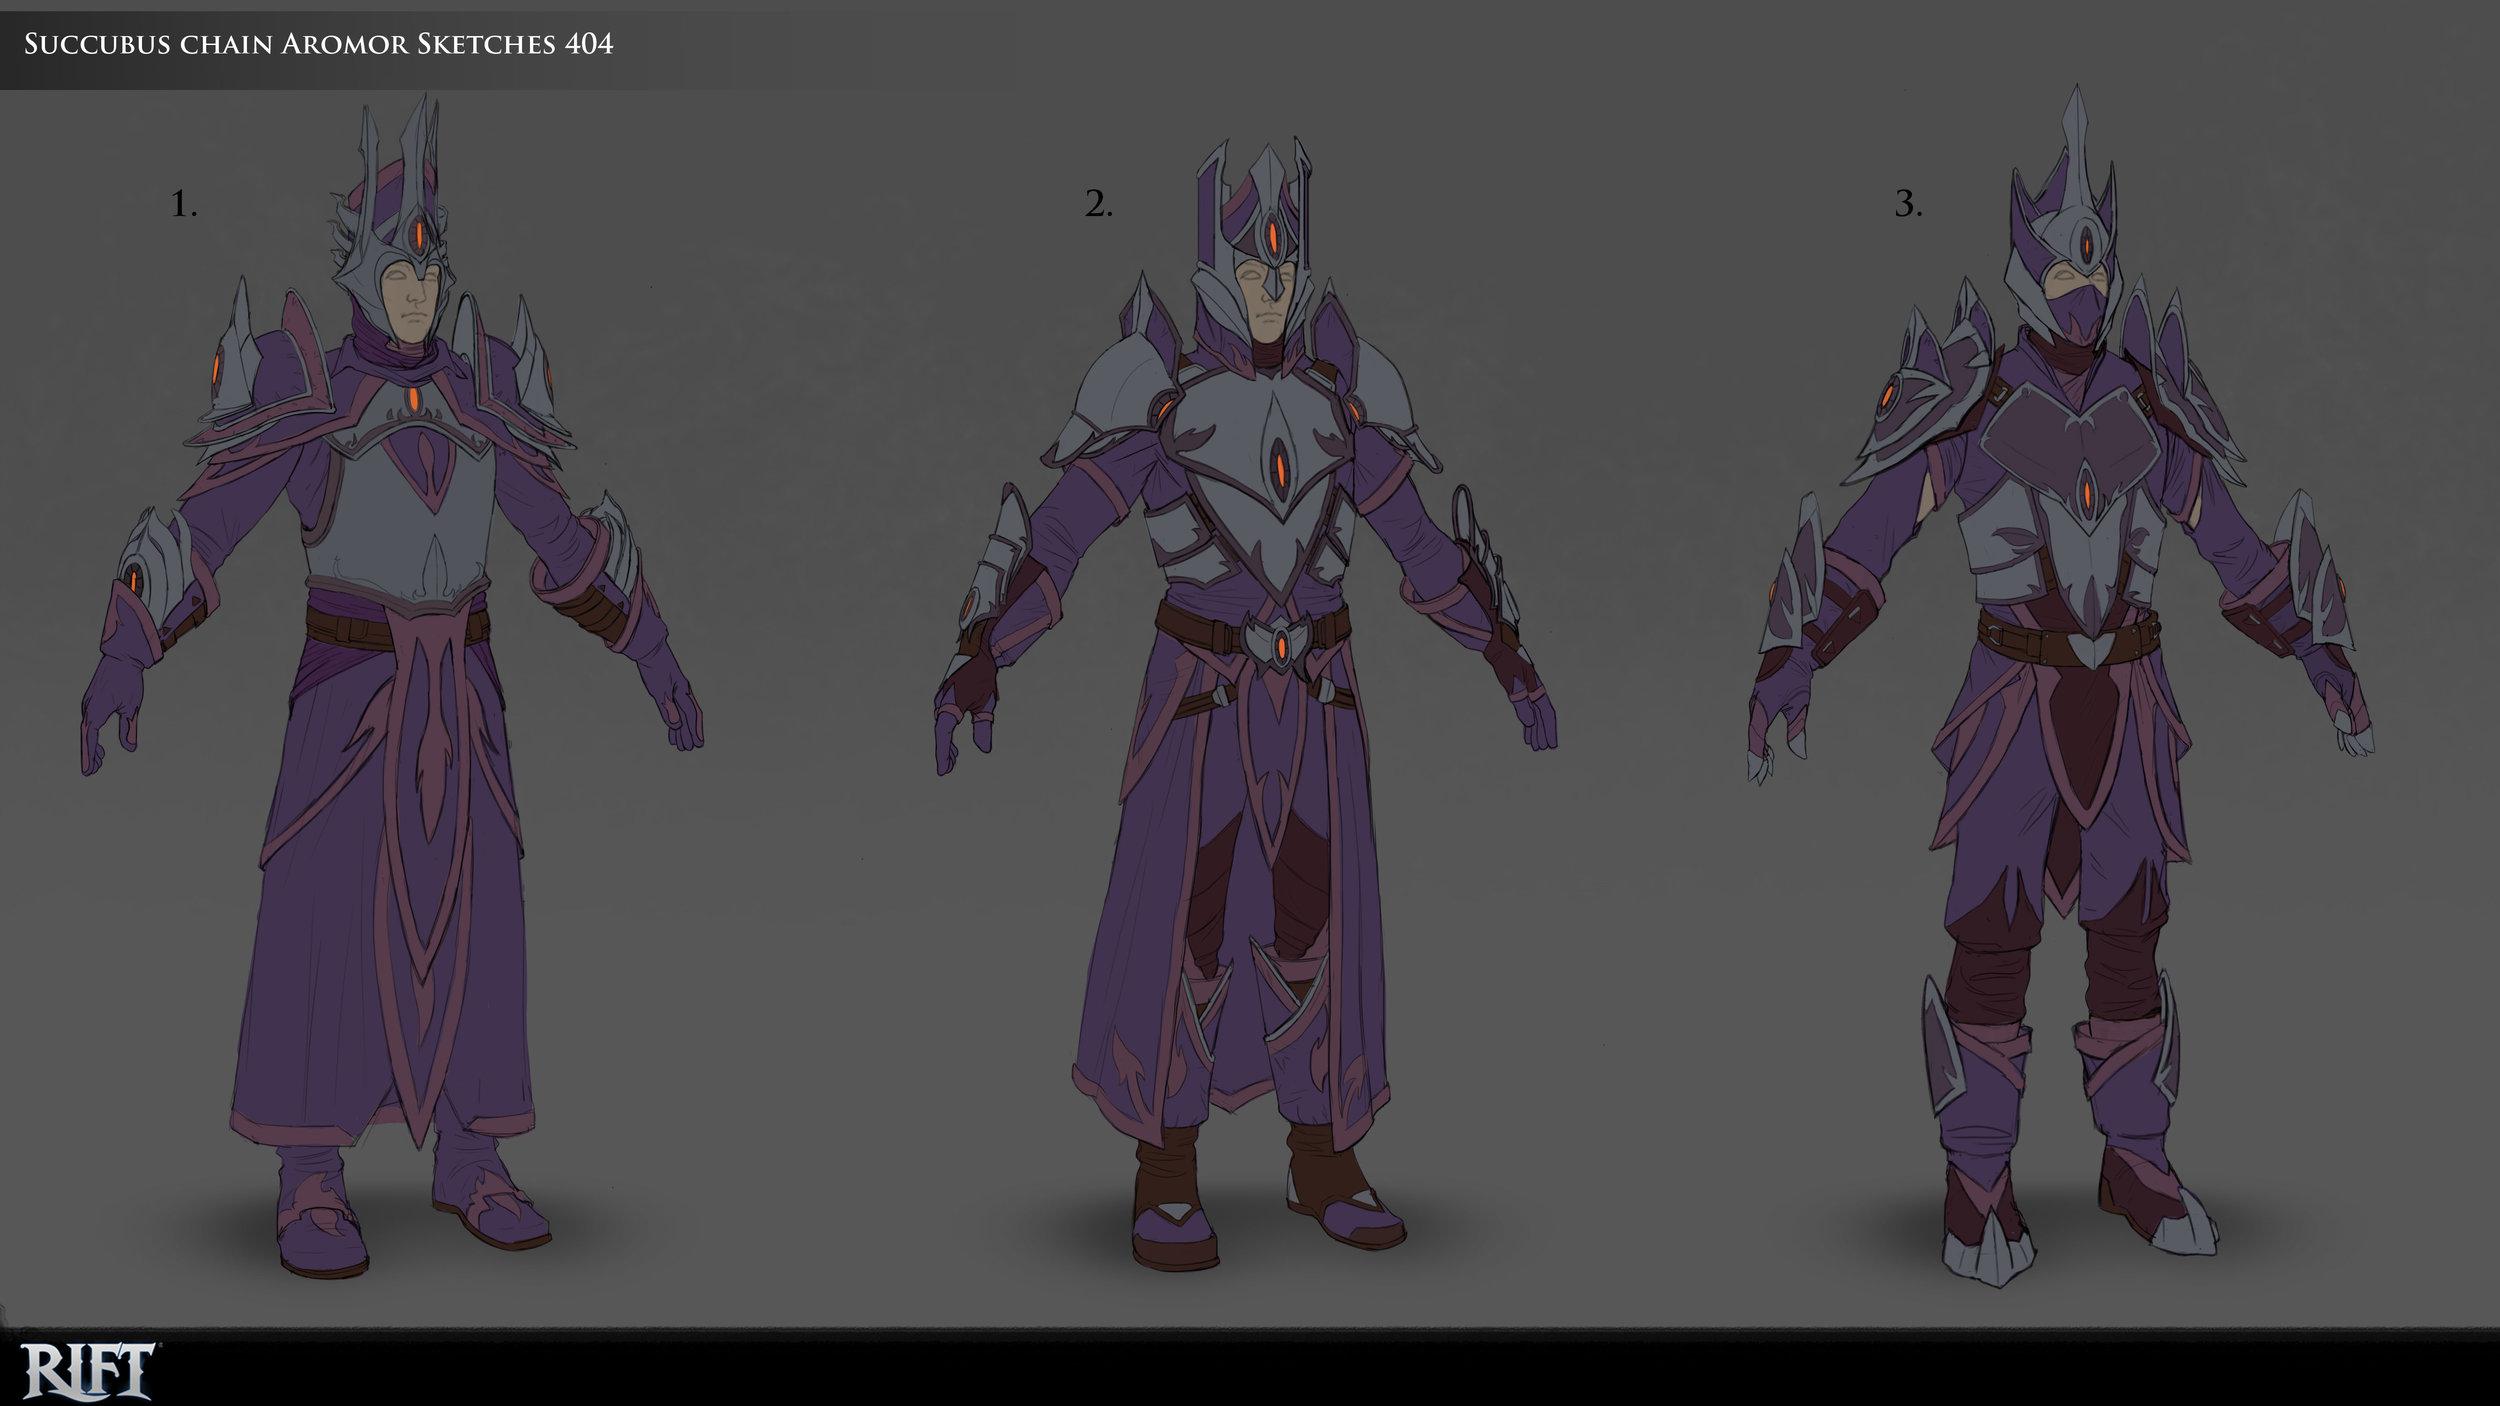 human_male_chain_sketches.jpg